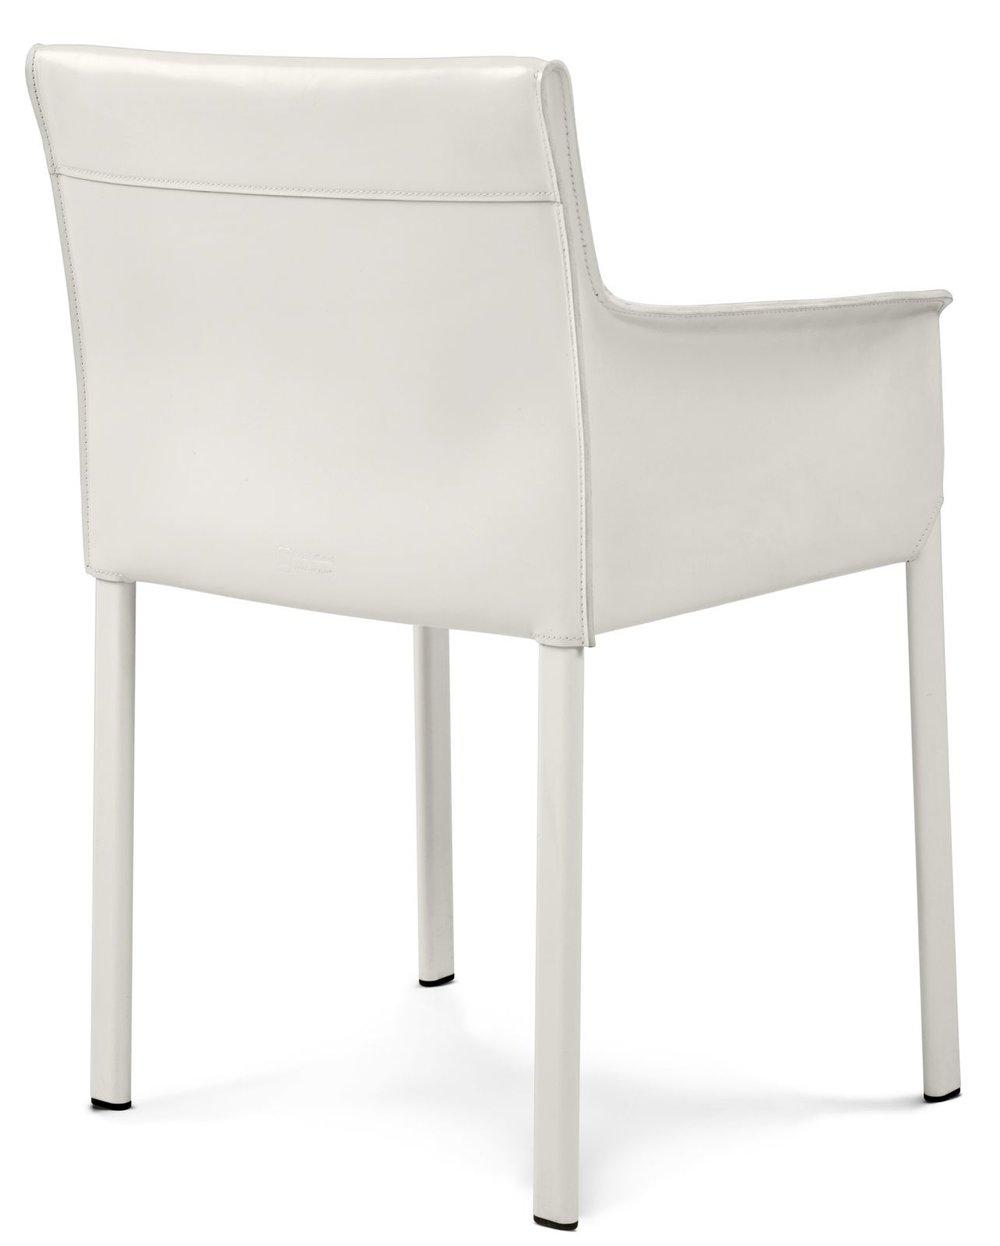 modern-office-armchairs-Italian-furniture-designer-armchairs (38).jpg